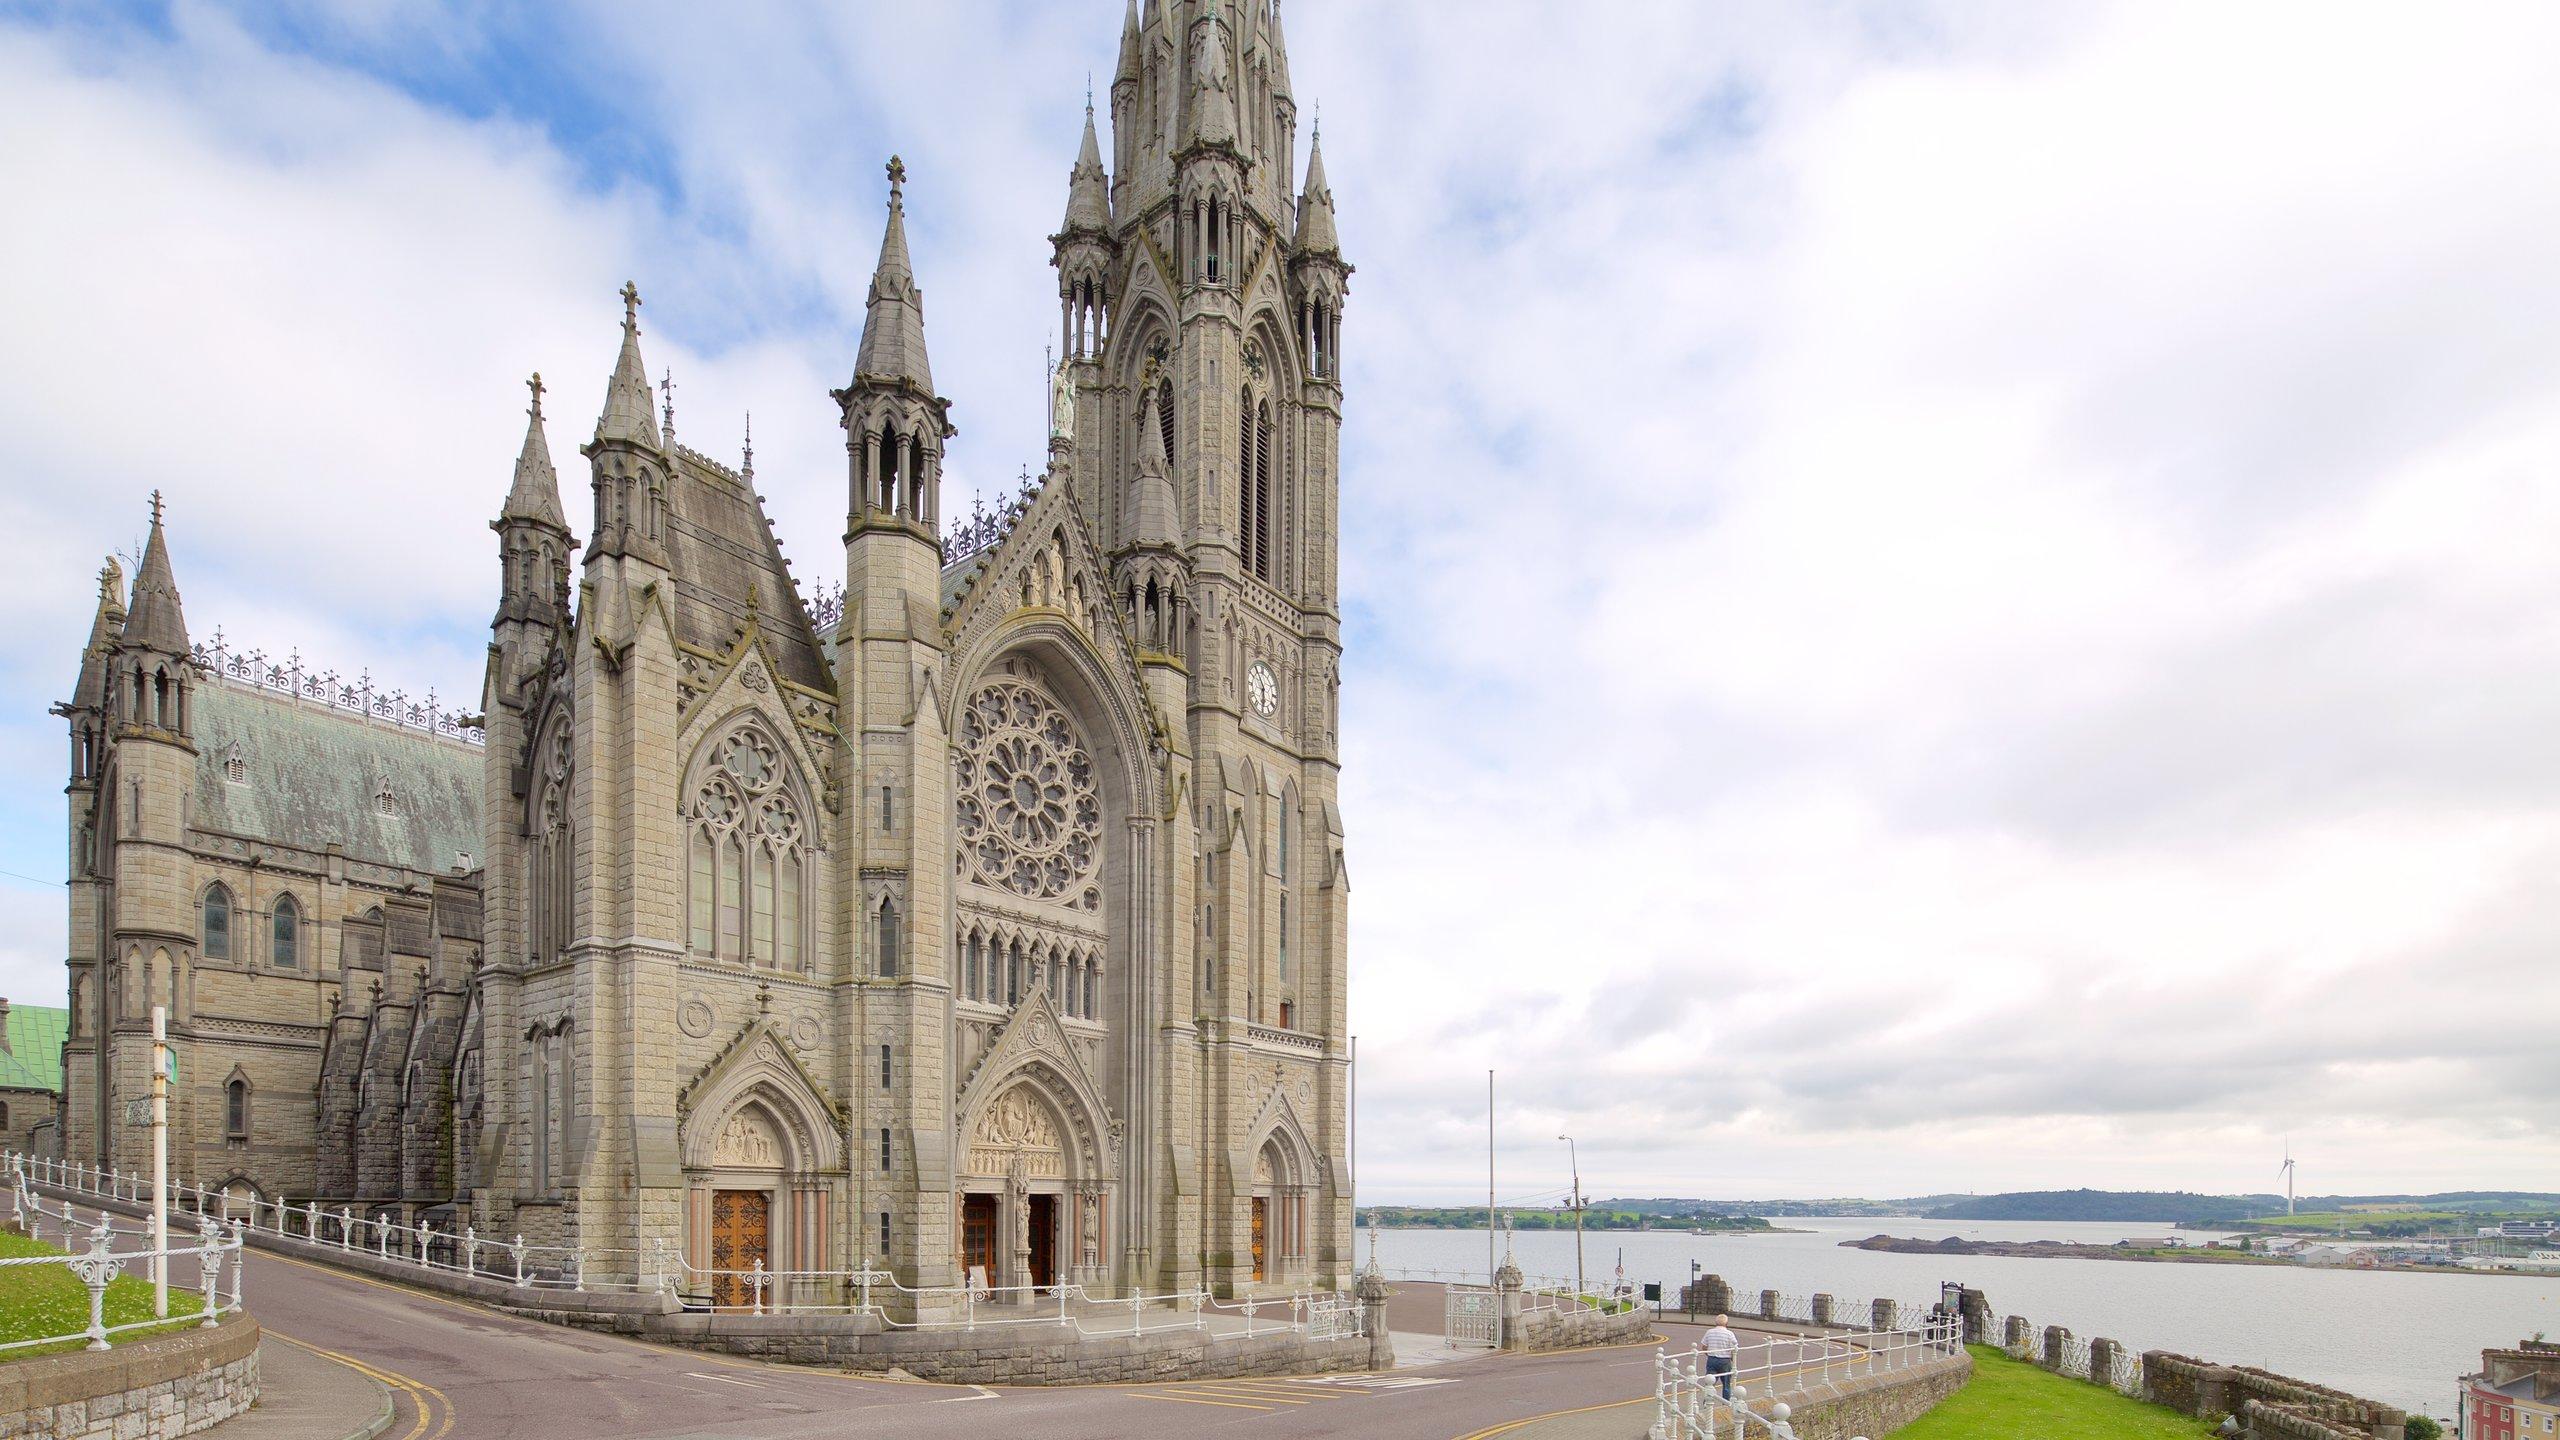 Kathedraal van Cobh (St. Colman's Cathedral), Cobh, Cork (graafschap), Ierland